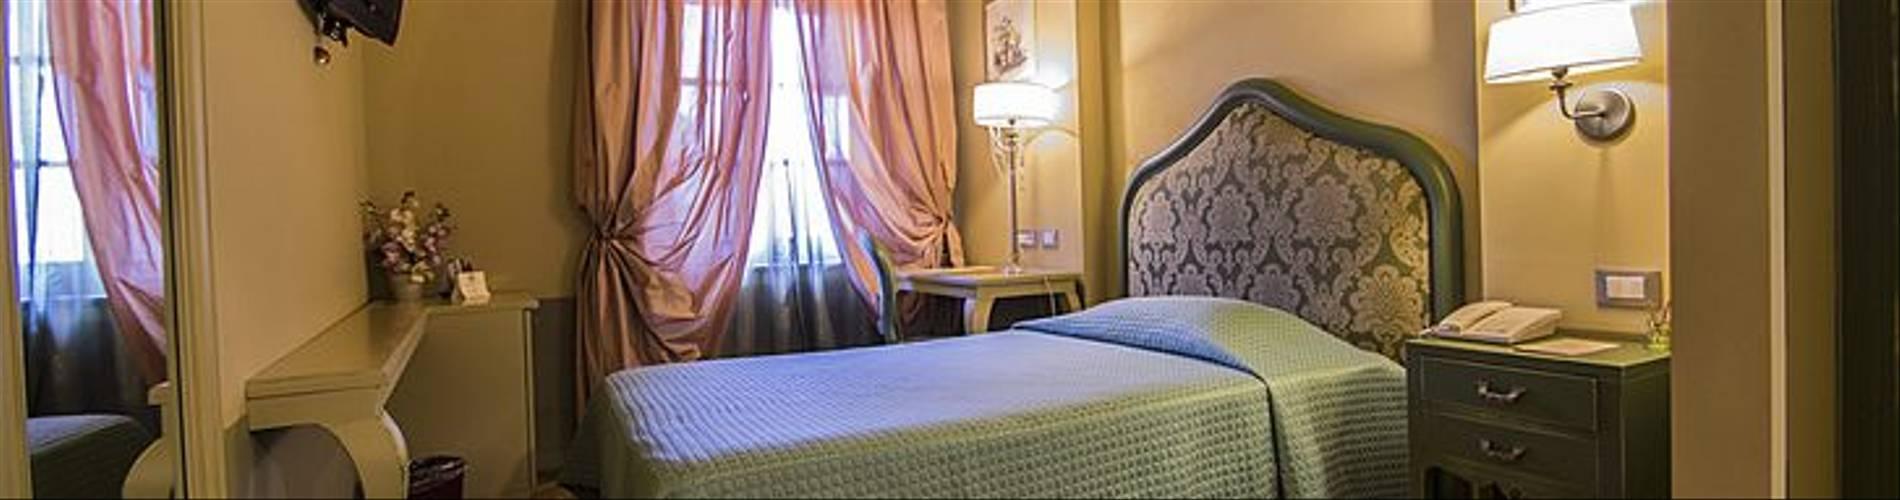 10-Hotel San Luca Palace.jpeg